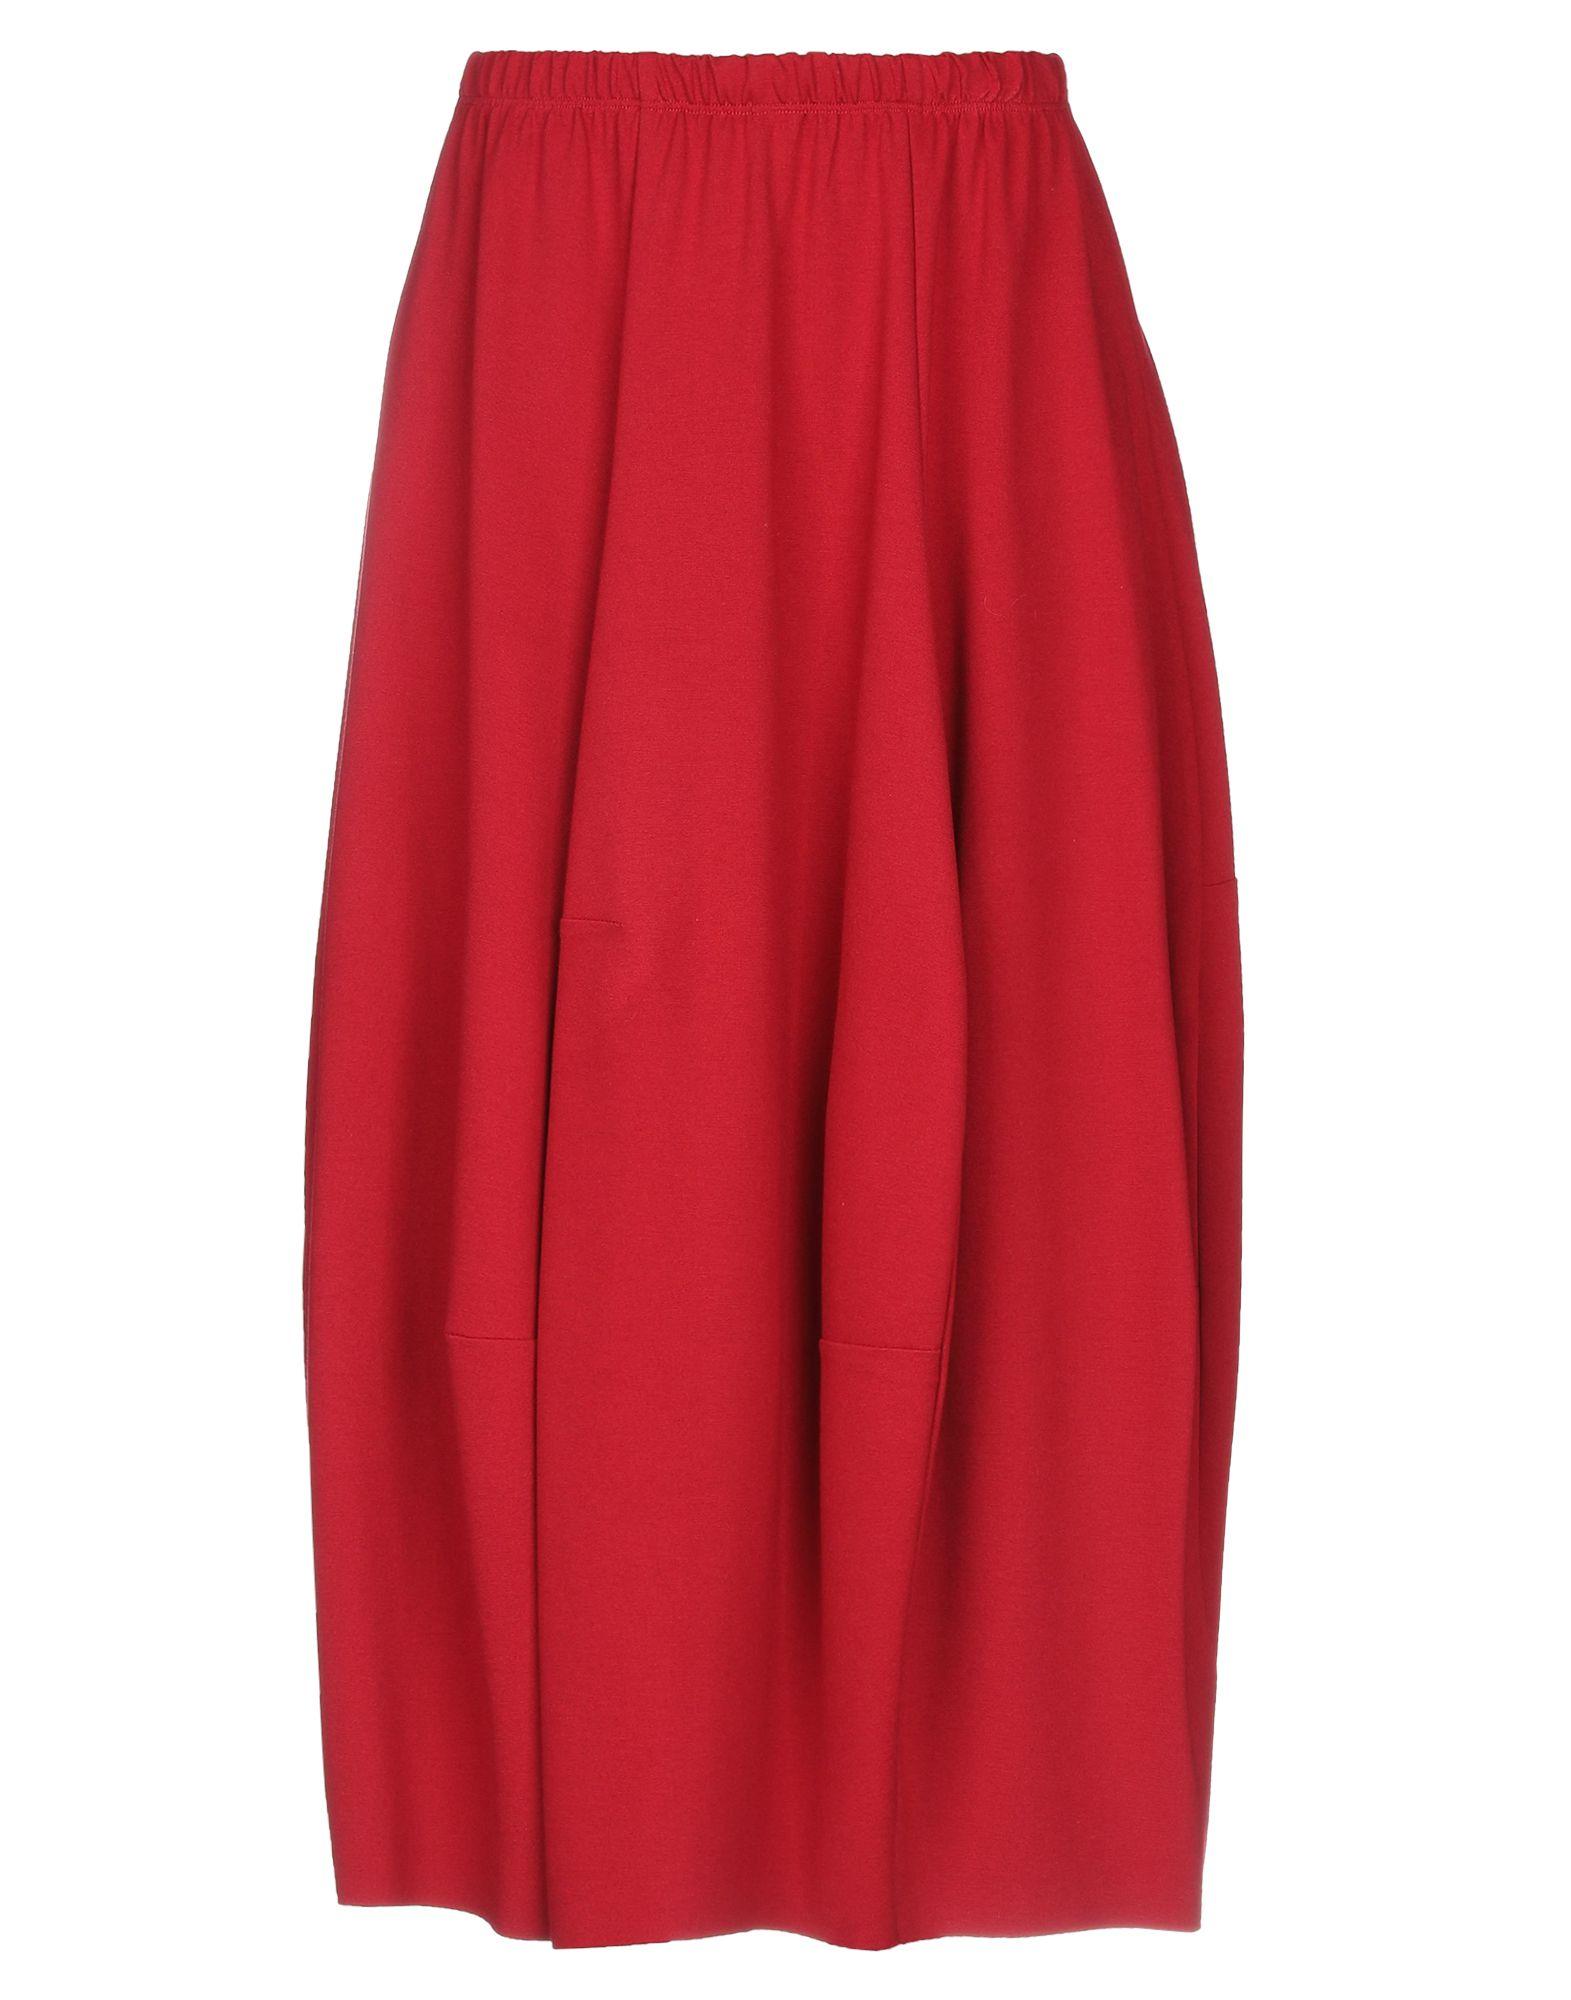 CORINNA CAON Юбка длиной 3/4 corinna caon юбка длиной 3 4